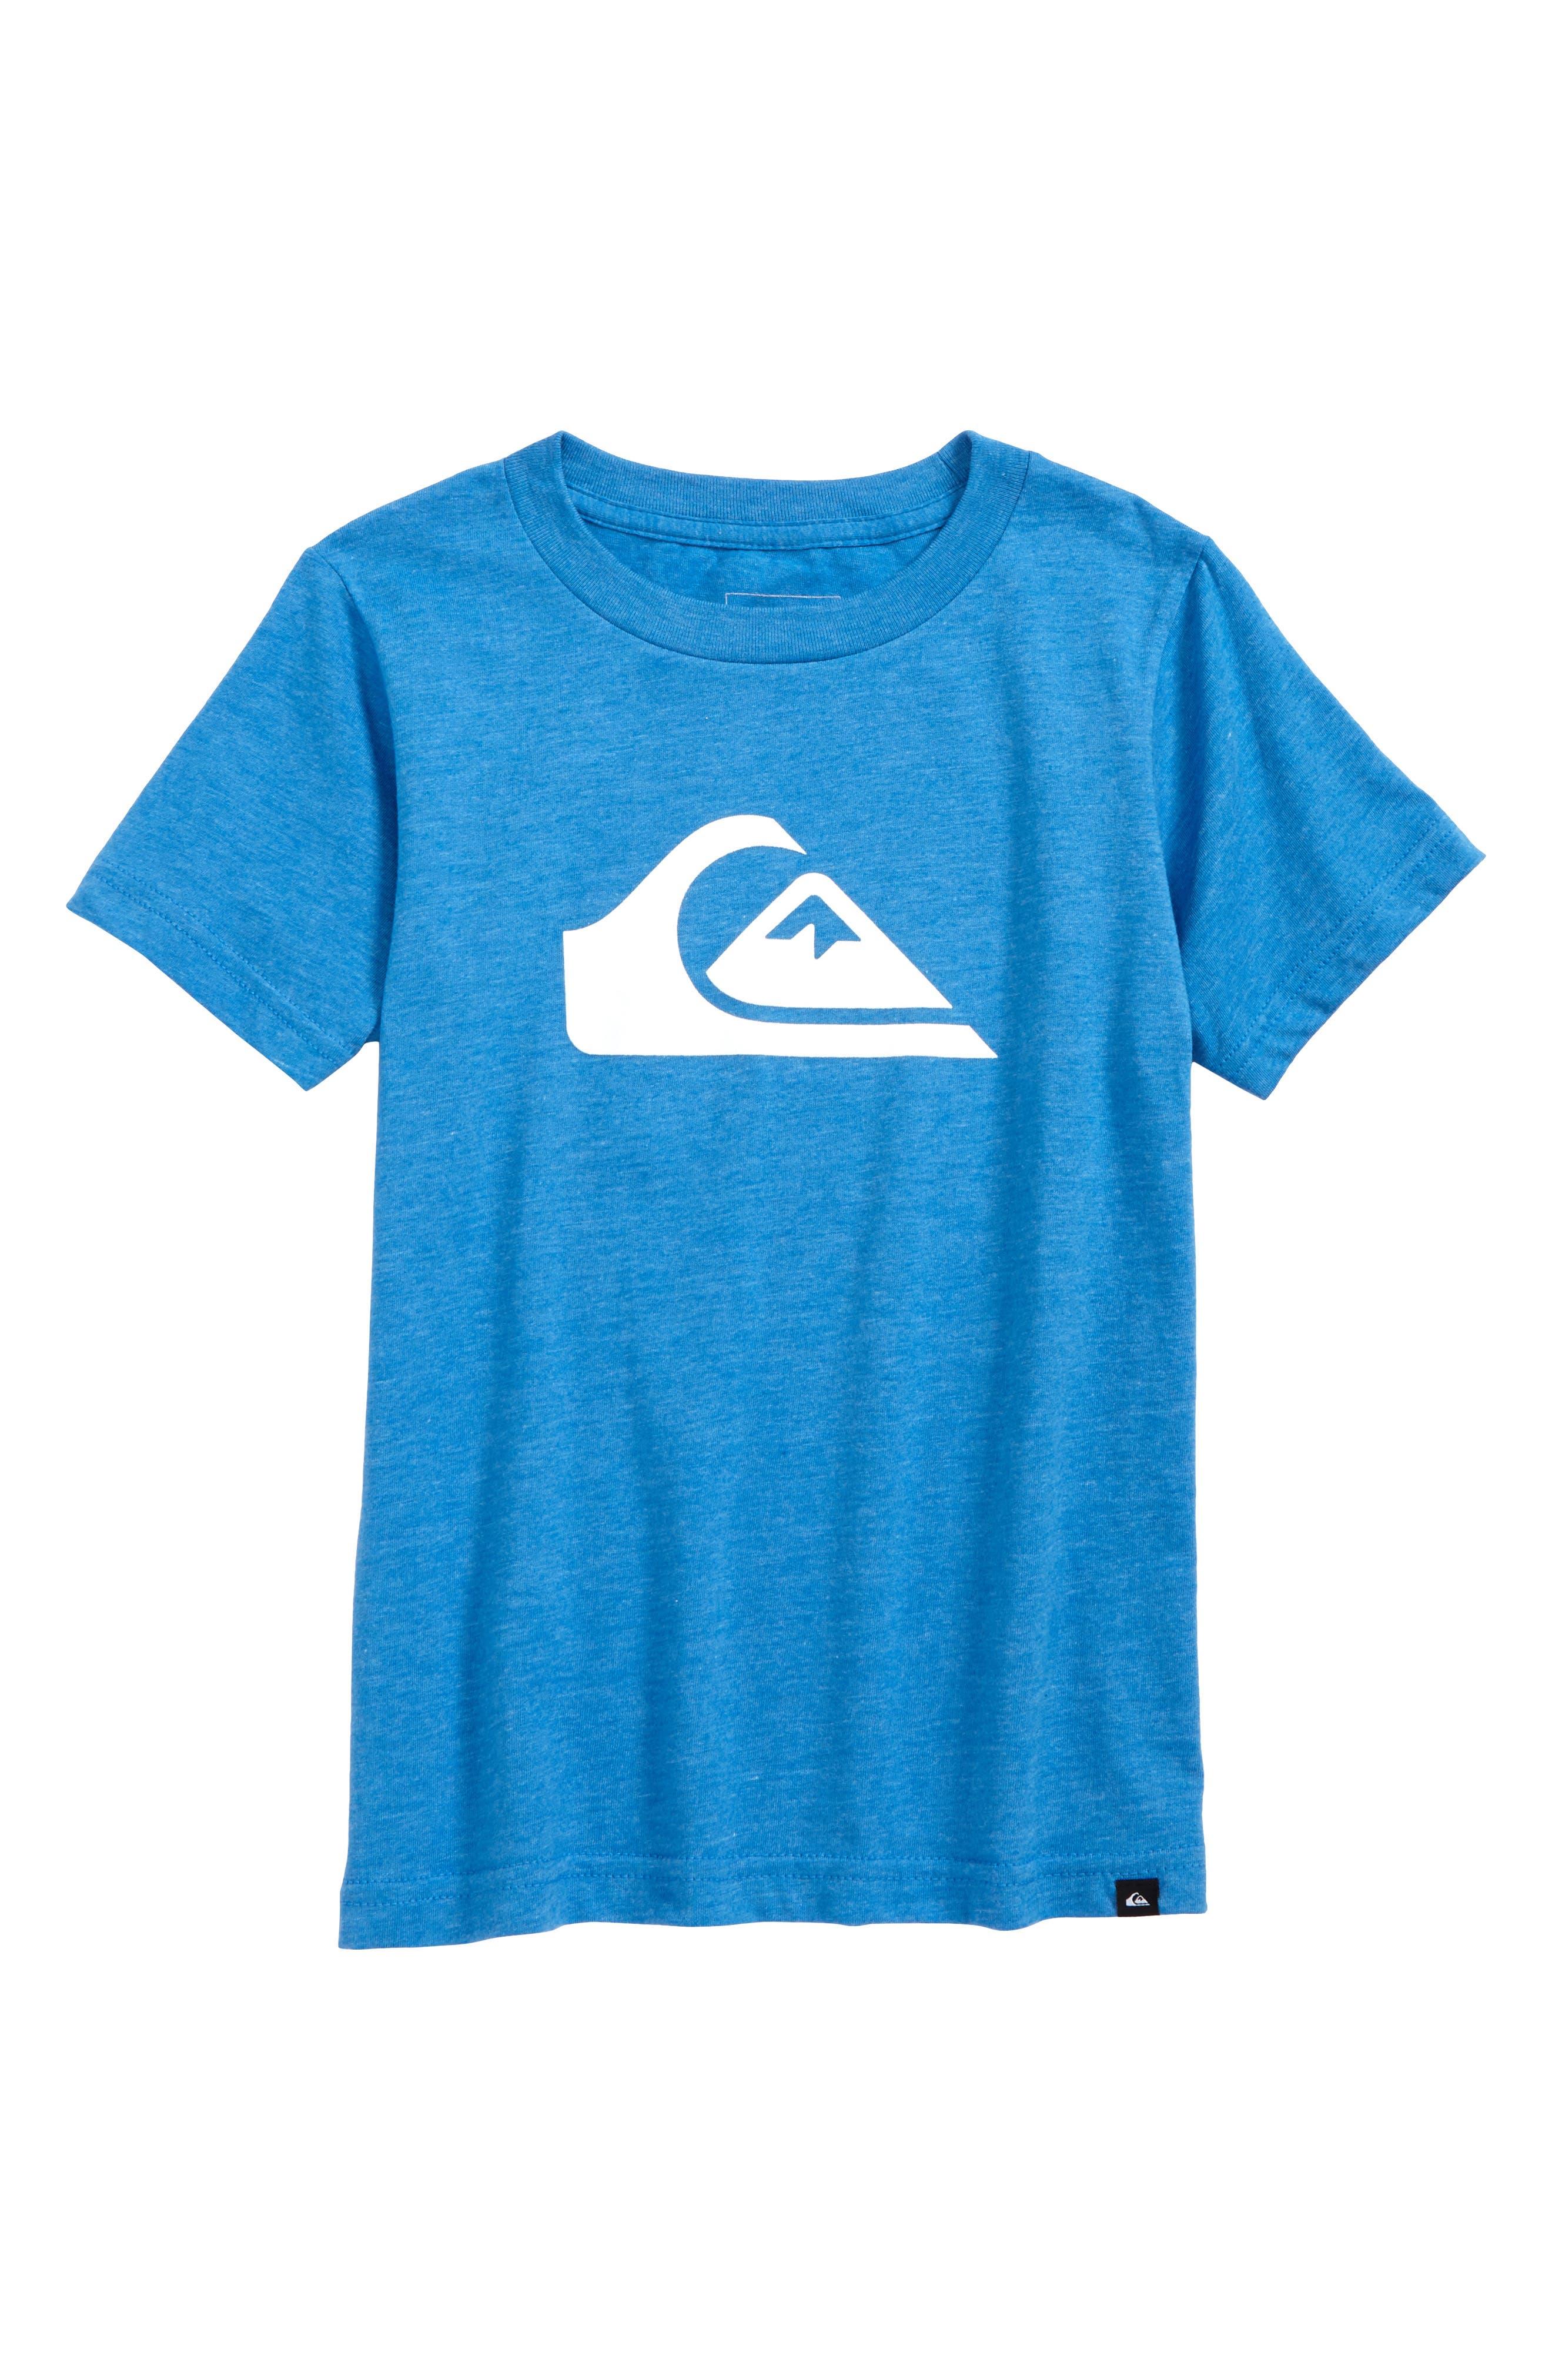 Quiksilver Logo Graphic T-Shirt (Toddler Boys & Little Boys)